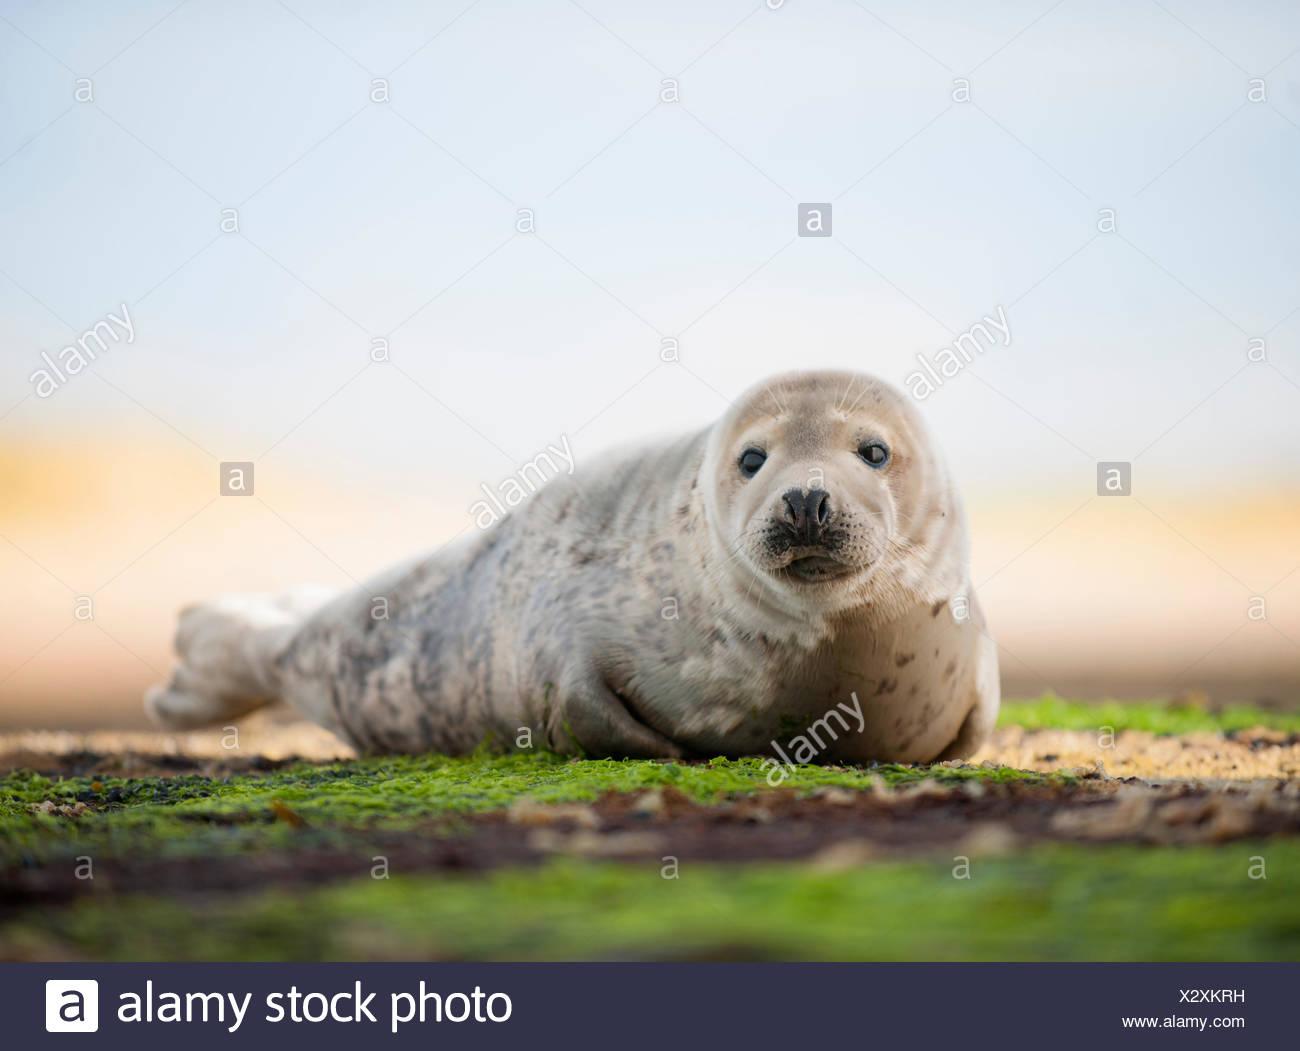 Portrait of common seal on beach - Stock Image